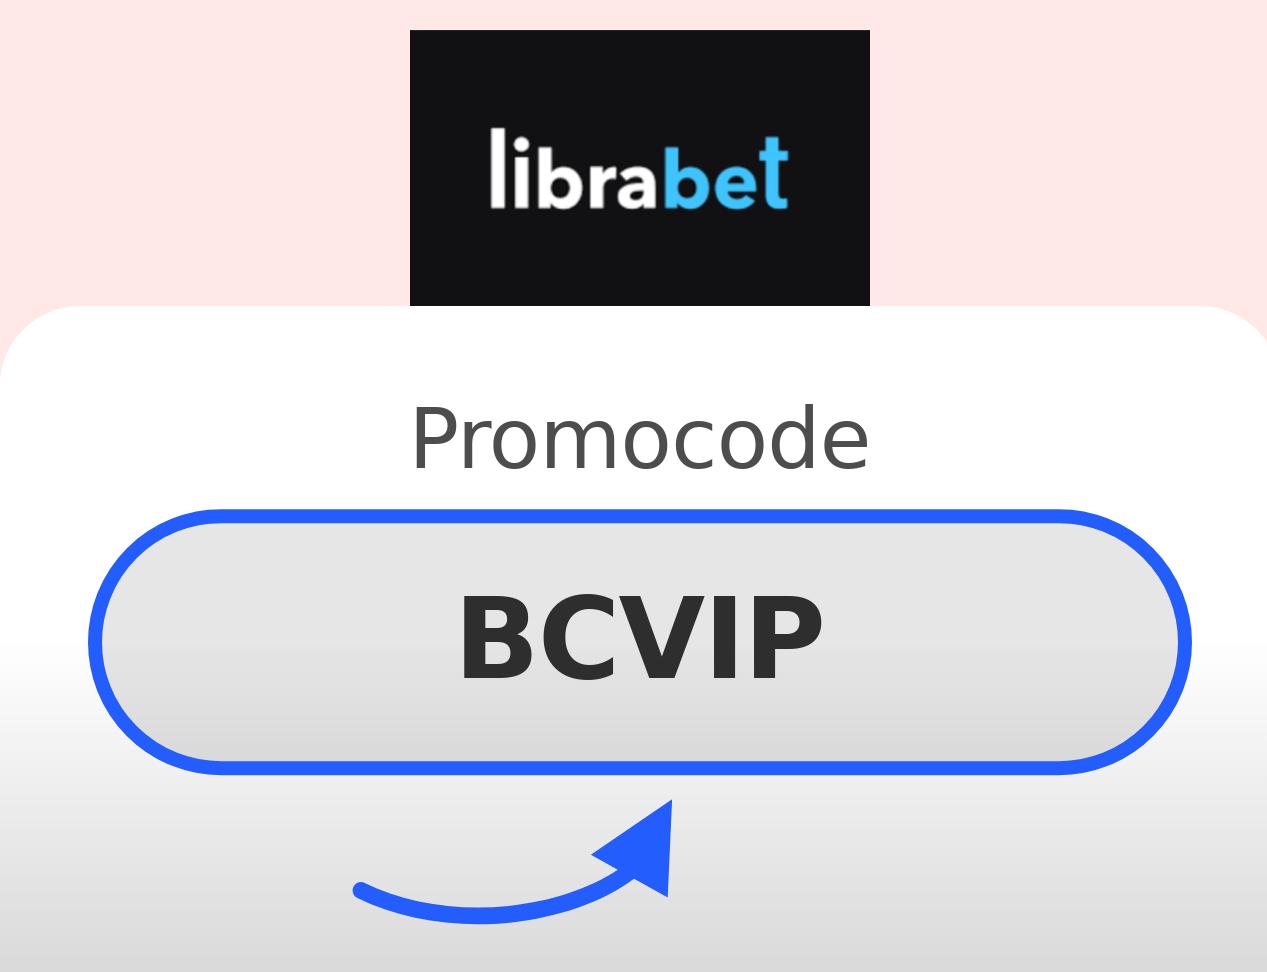 Librabet Promocode